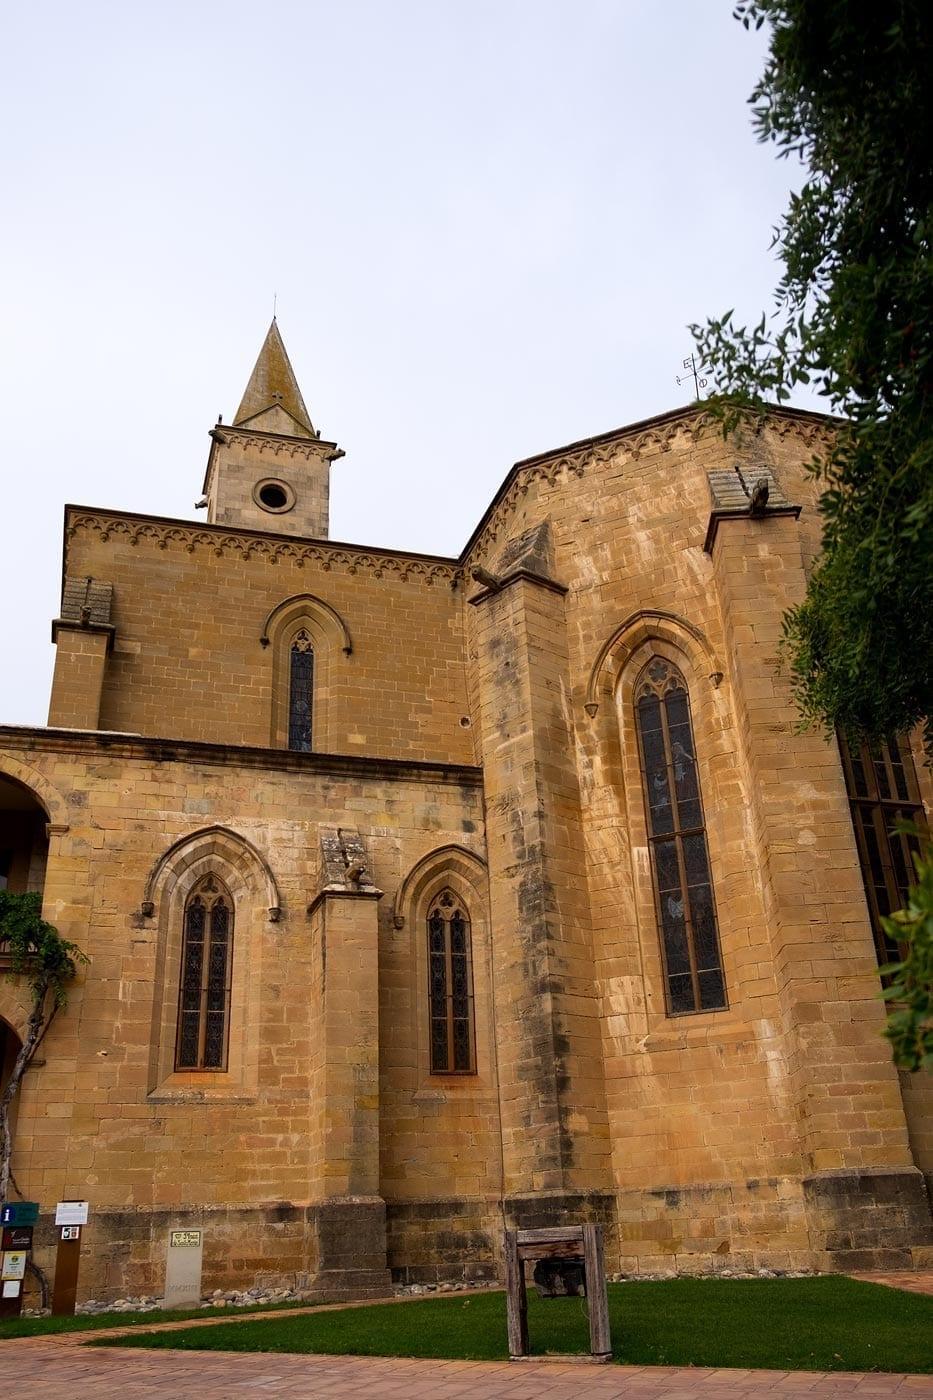 Monasterio de Santa María de Bellpuig de las Avellanes, gothische Kirchenfenster